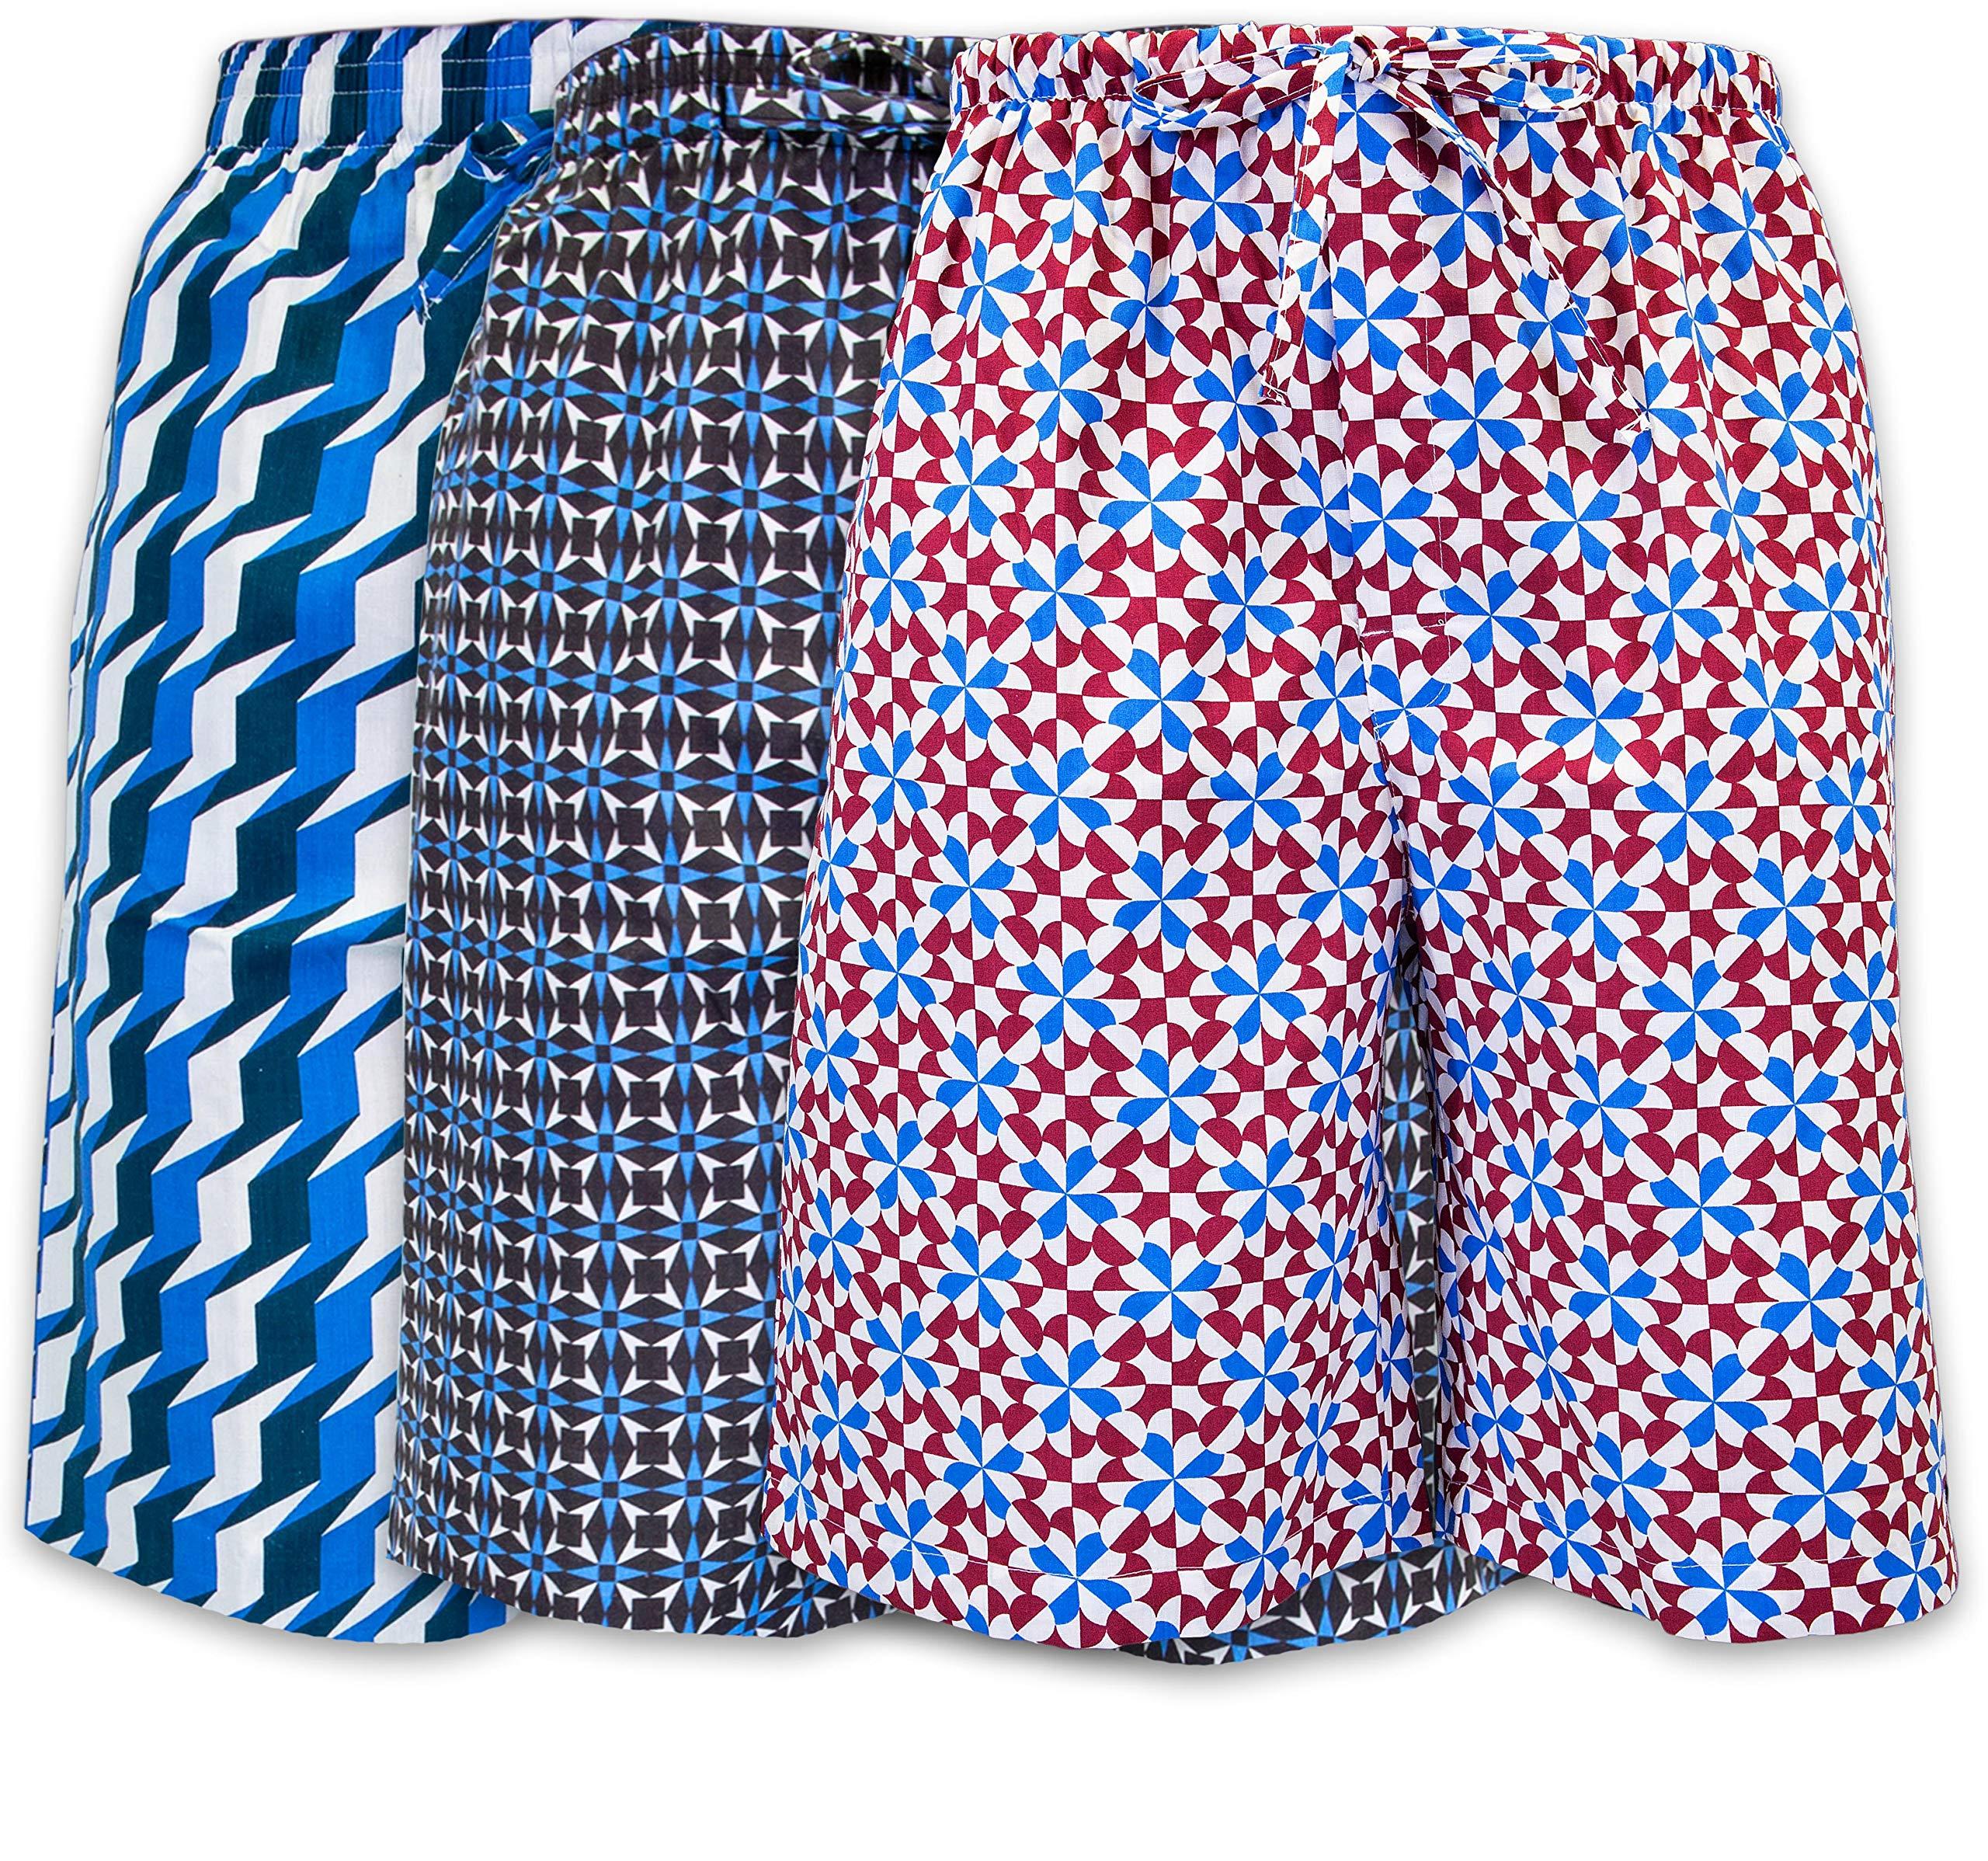 Men's Lounge Pajama Sleep Shorts/Woven Jam Dorm Shorts Drawstring & Pockets - 3 Pack (3 Pack- Geometrics 2, 3XL)